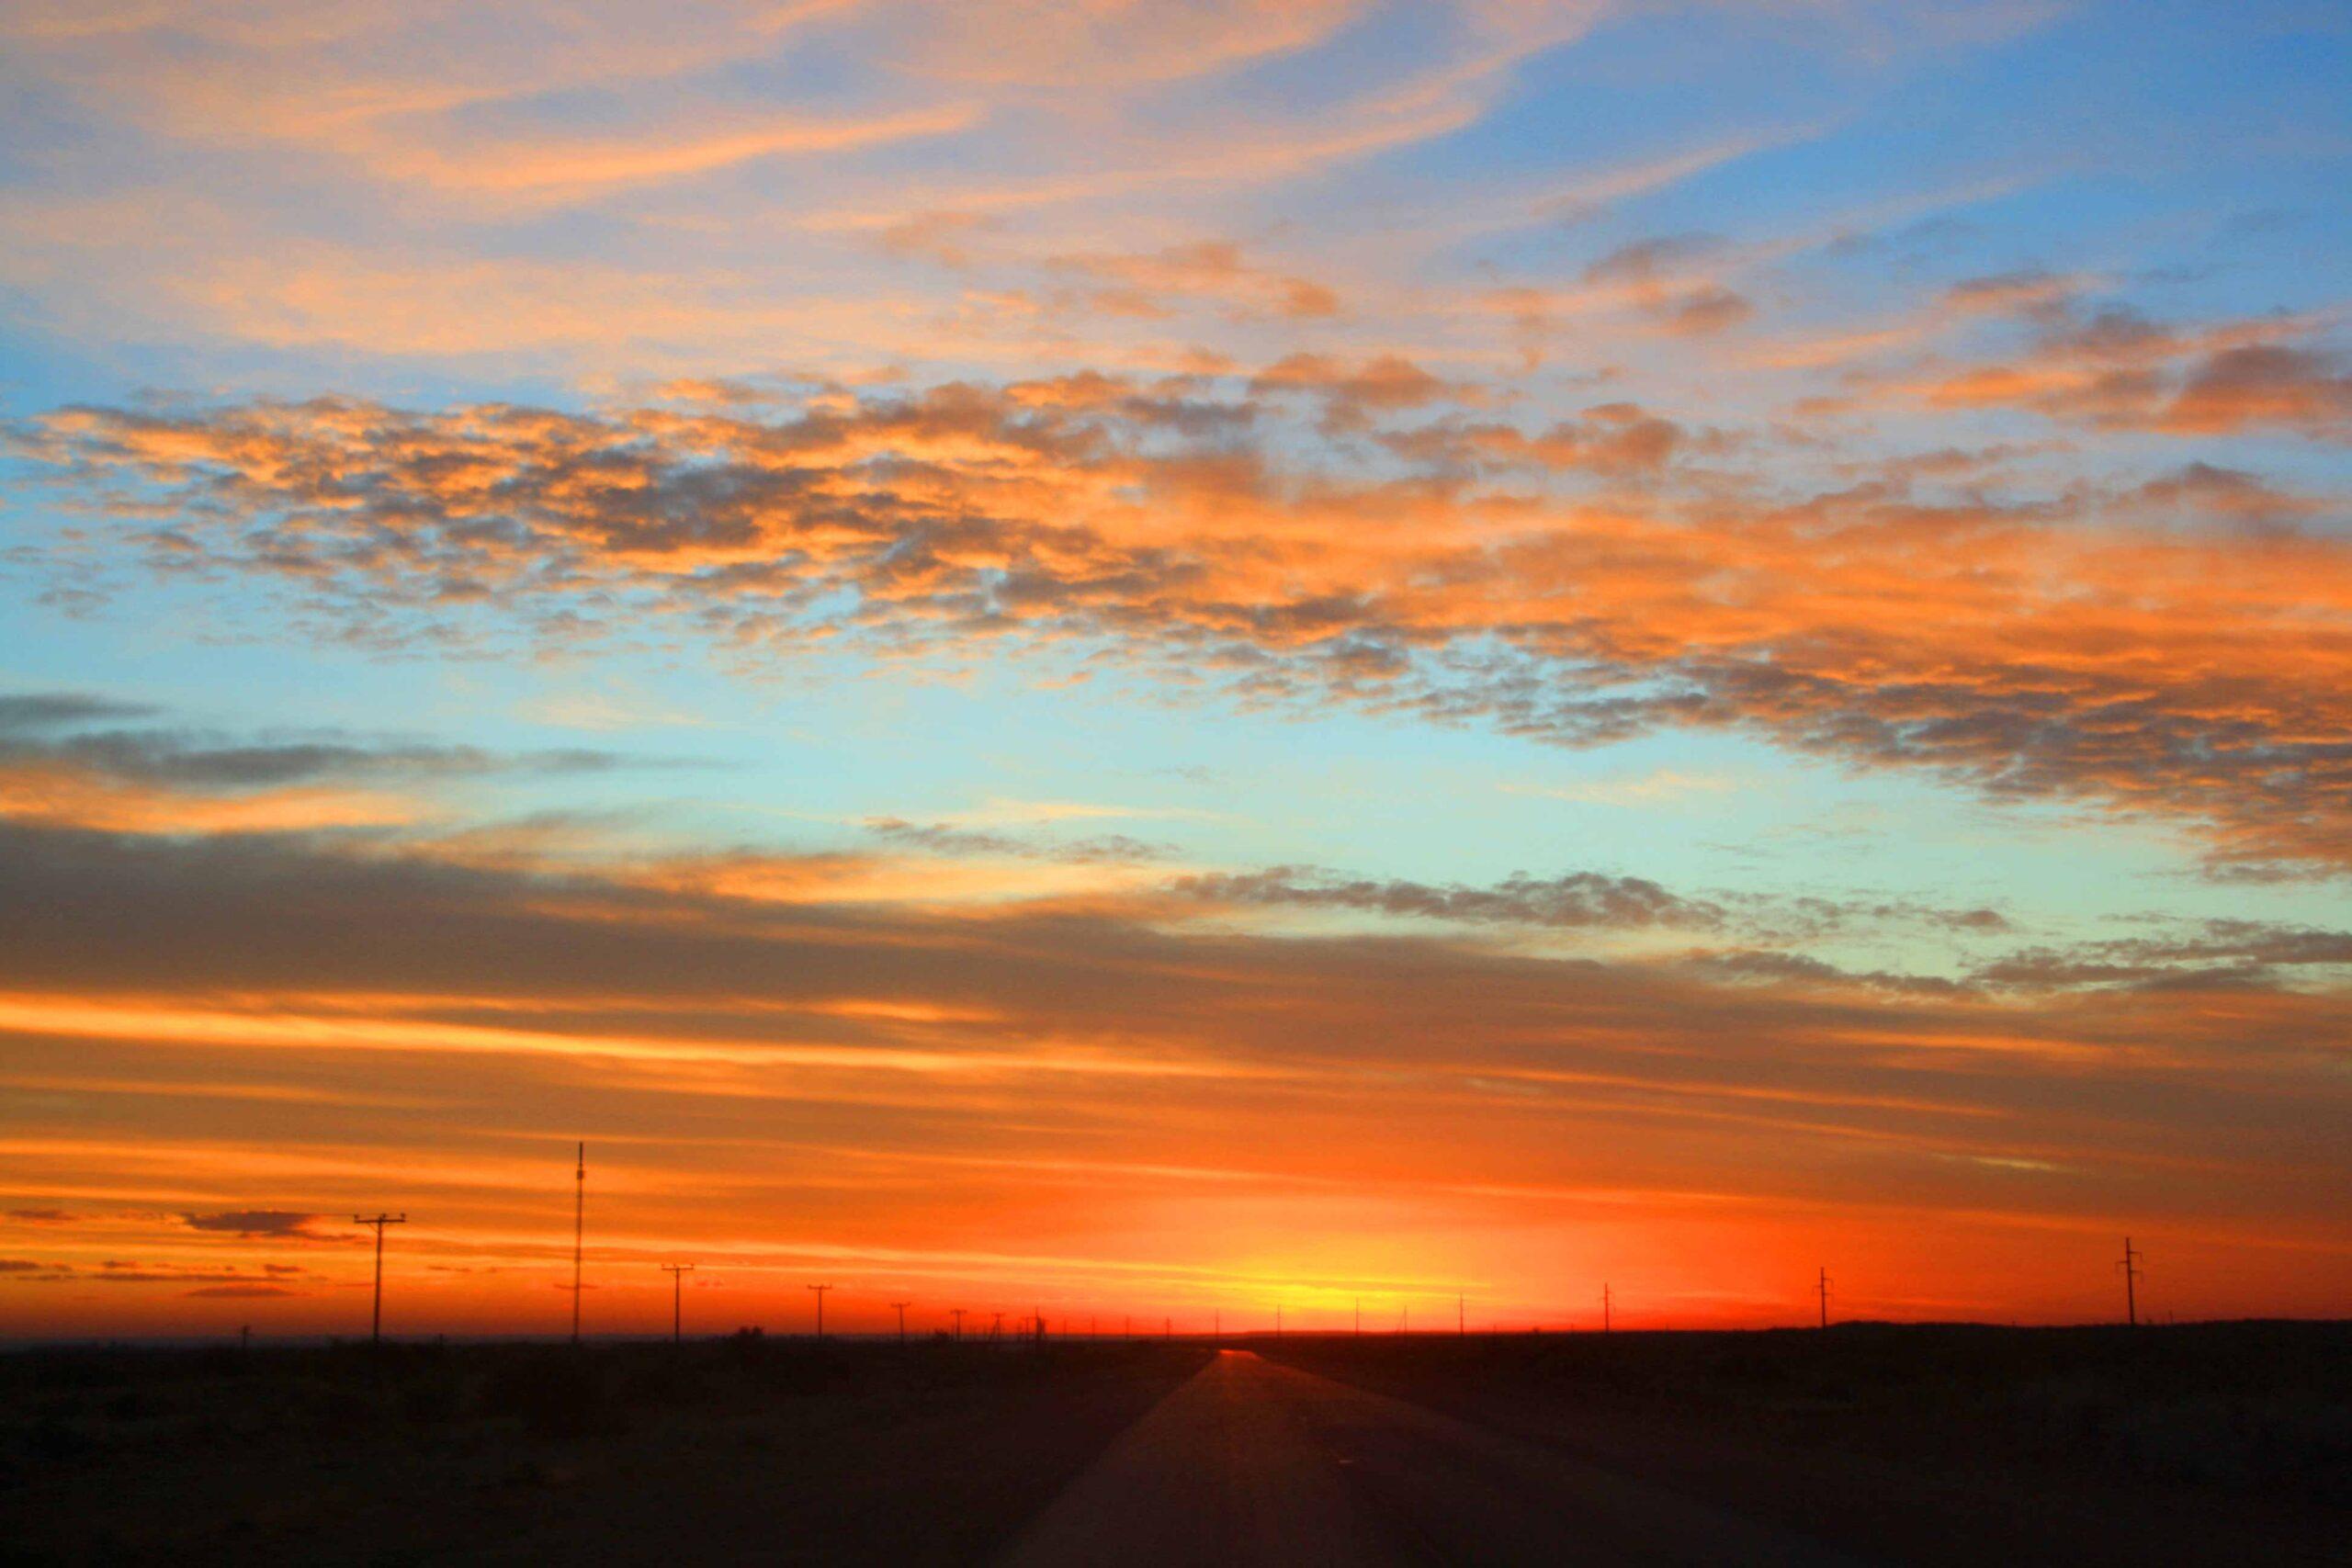 sunset sky roadtrip ushuaia